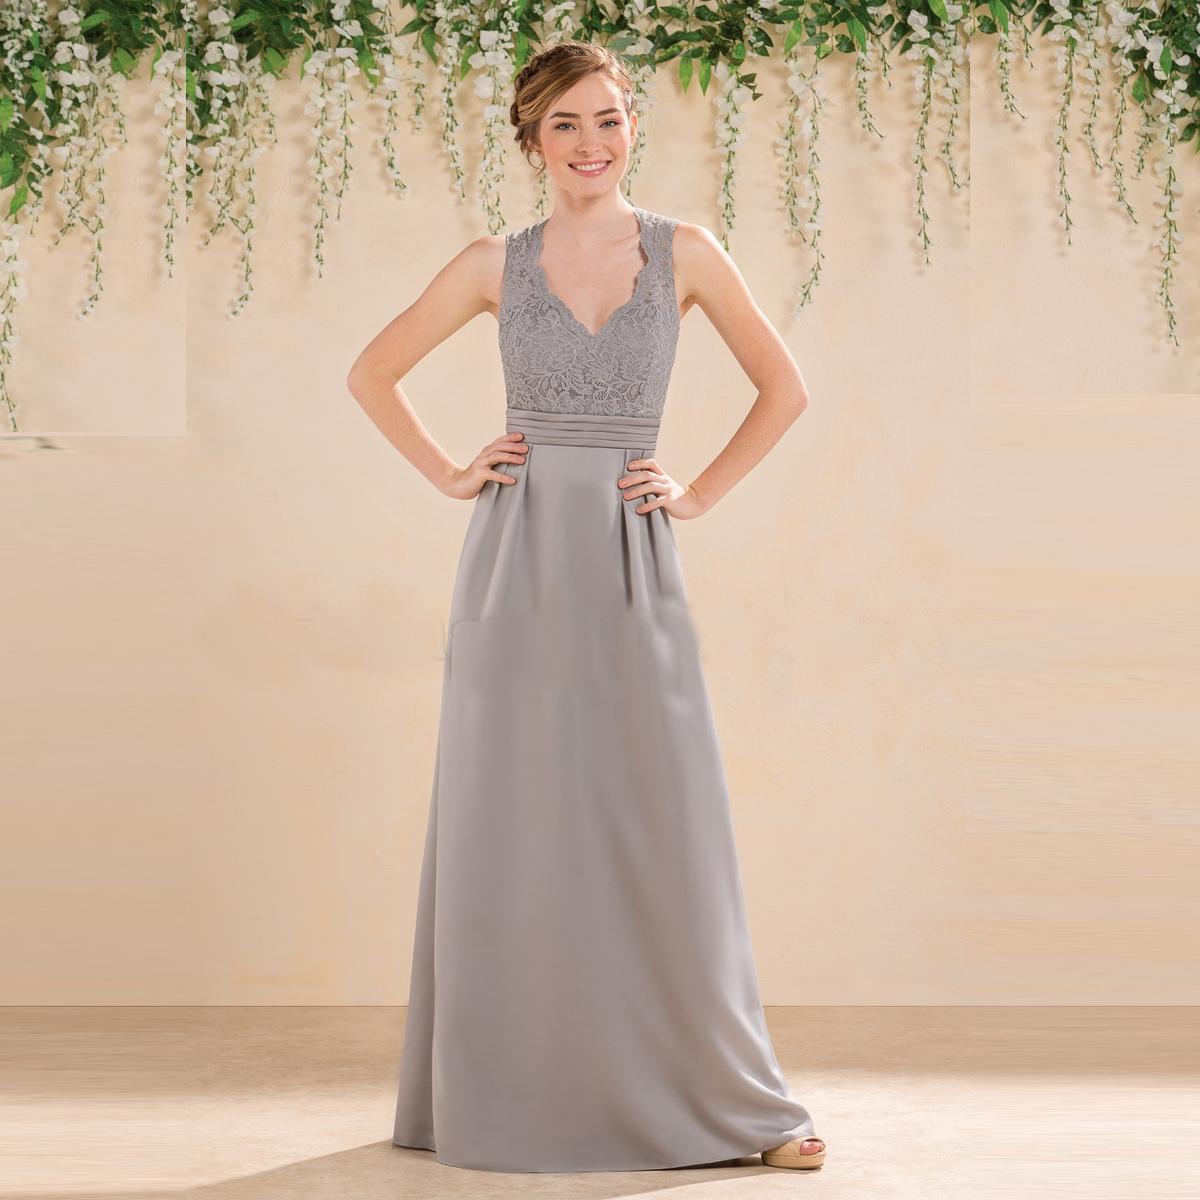 e25b87276c827 Grey long bridesmaid dresses Lace Chiffon Bridesmaid Dress Prom Dress Prom  Gowns Evening Dress Cheap dress